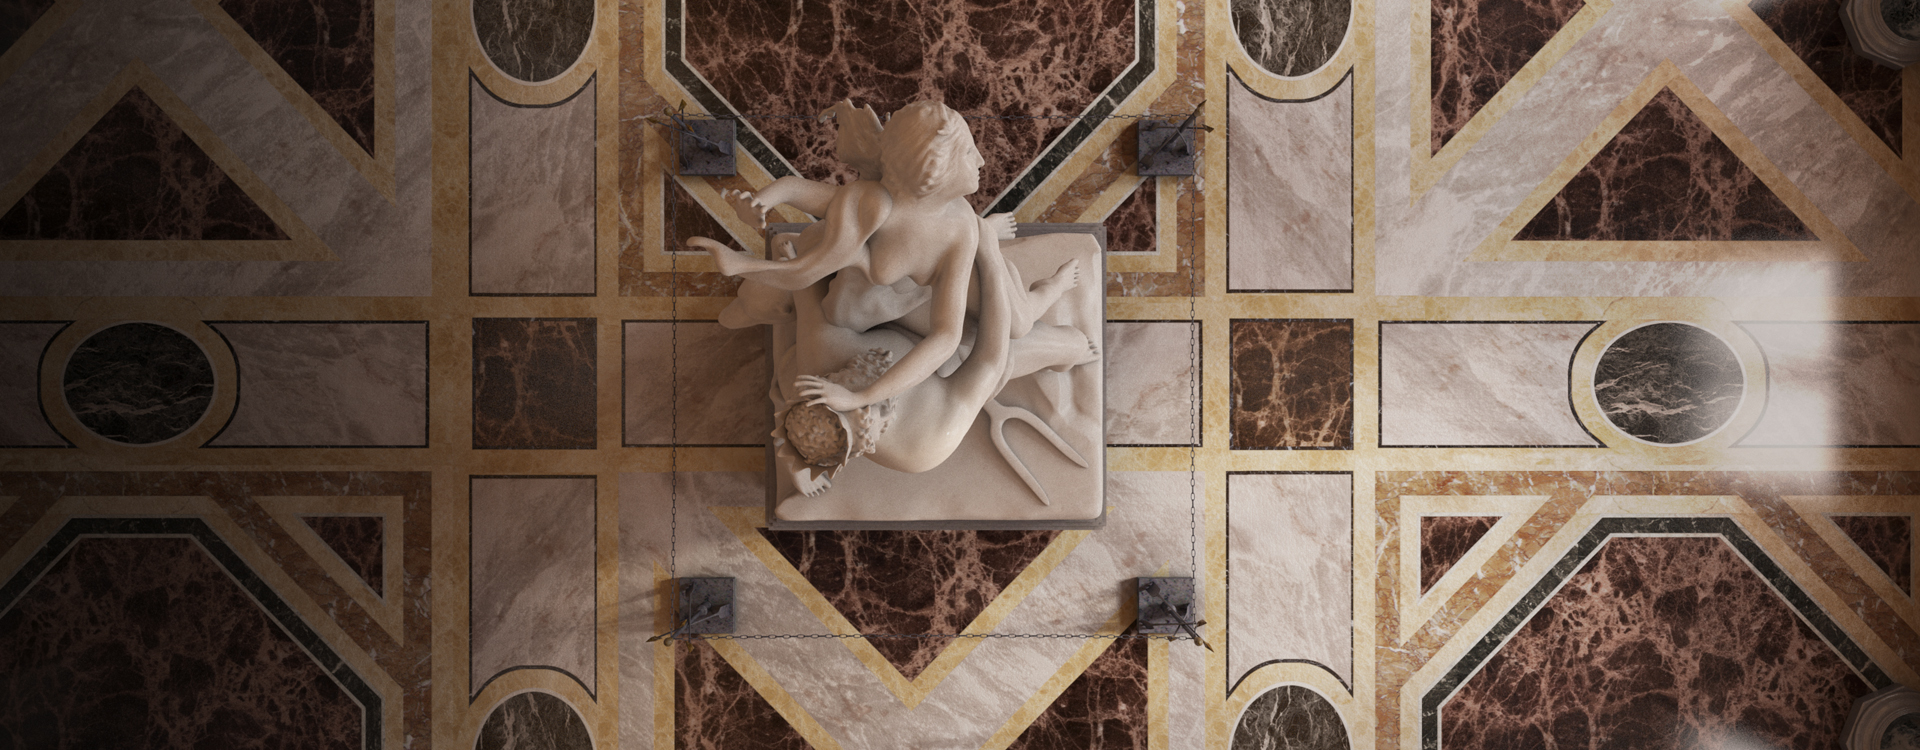 Galleria Borghese-04_1.jpg